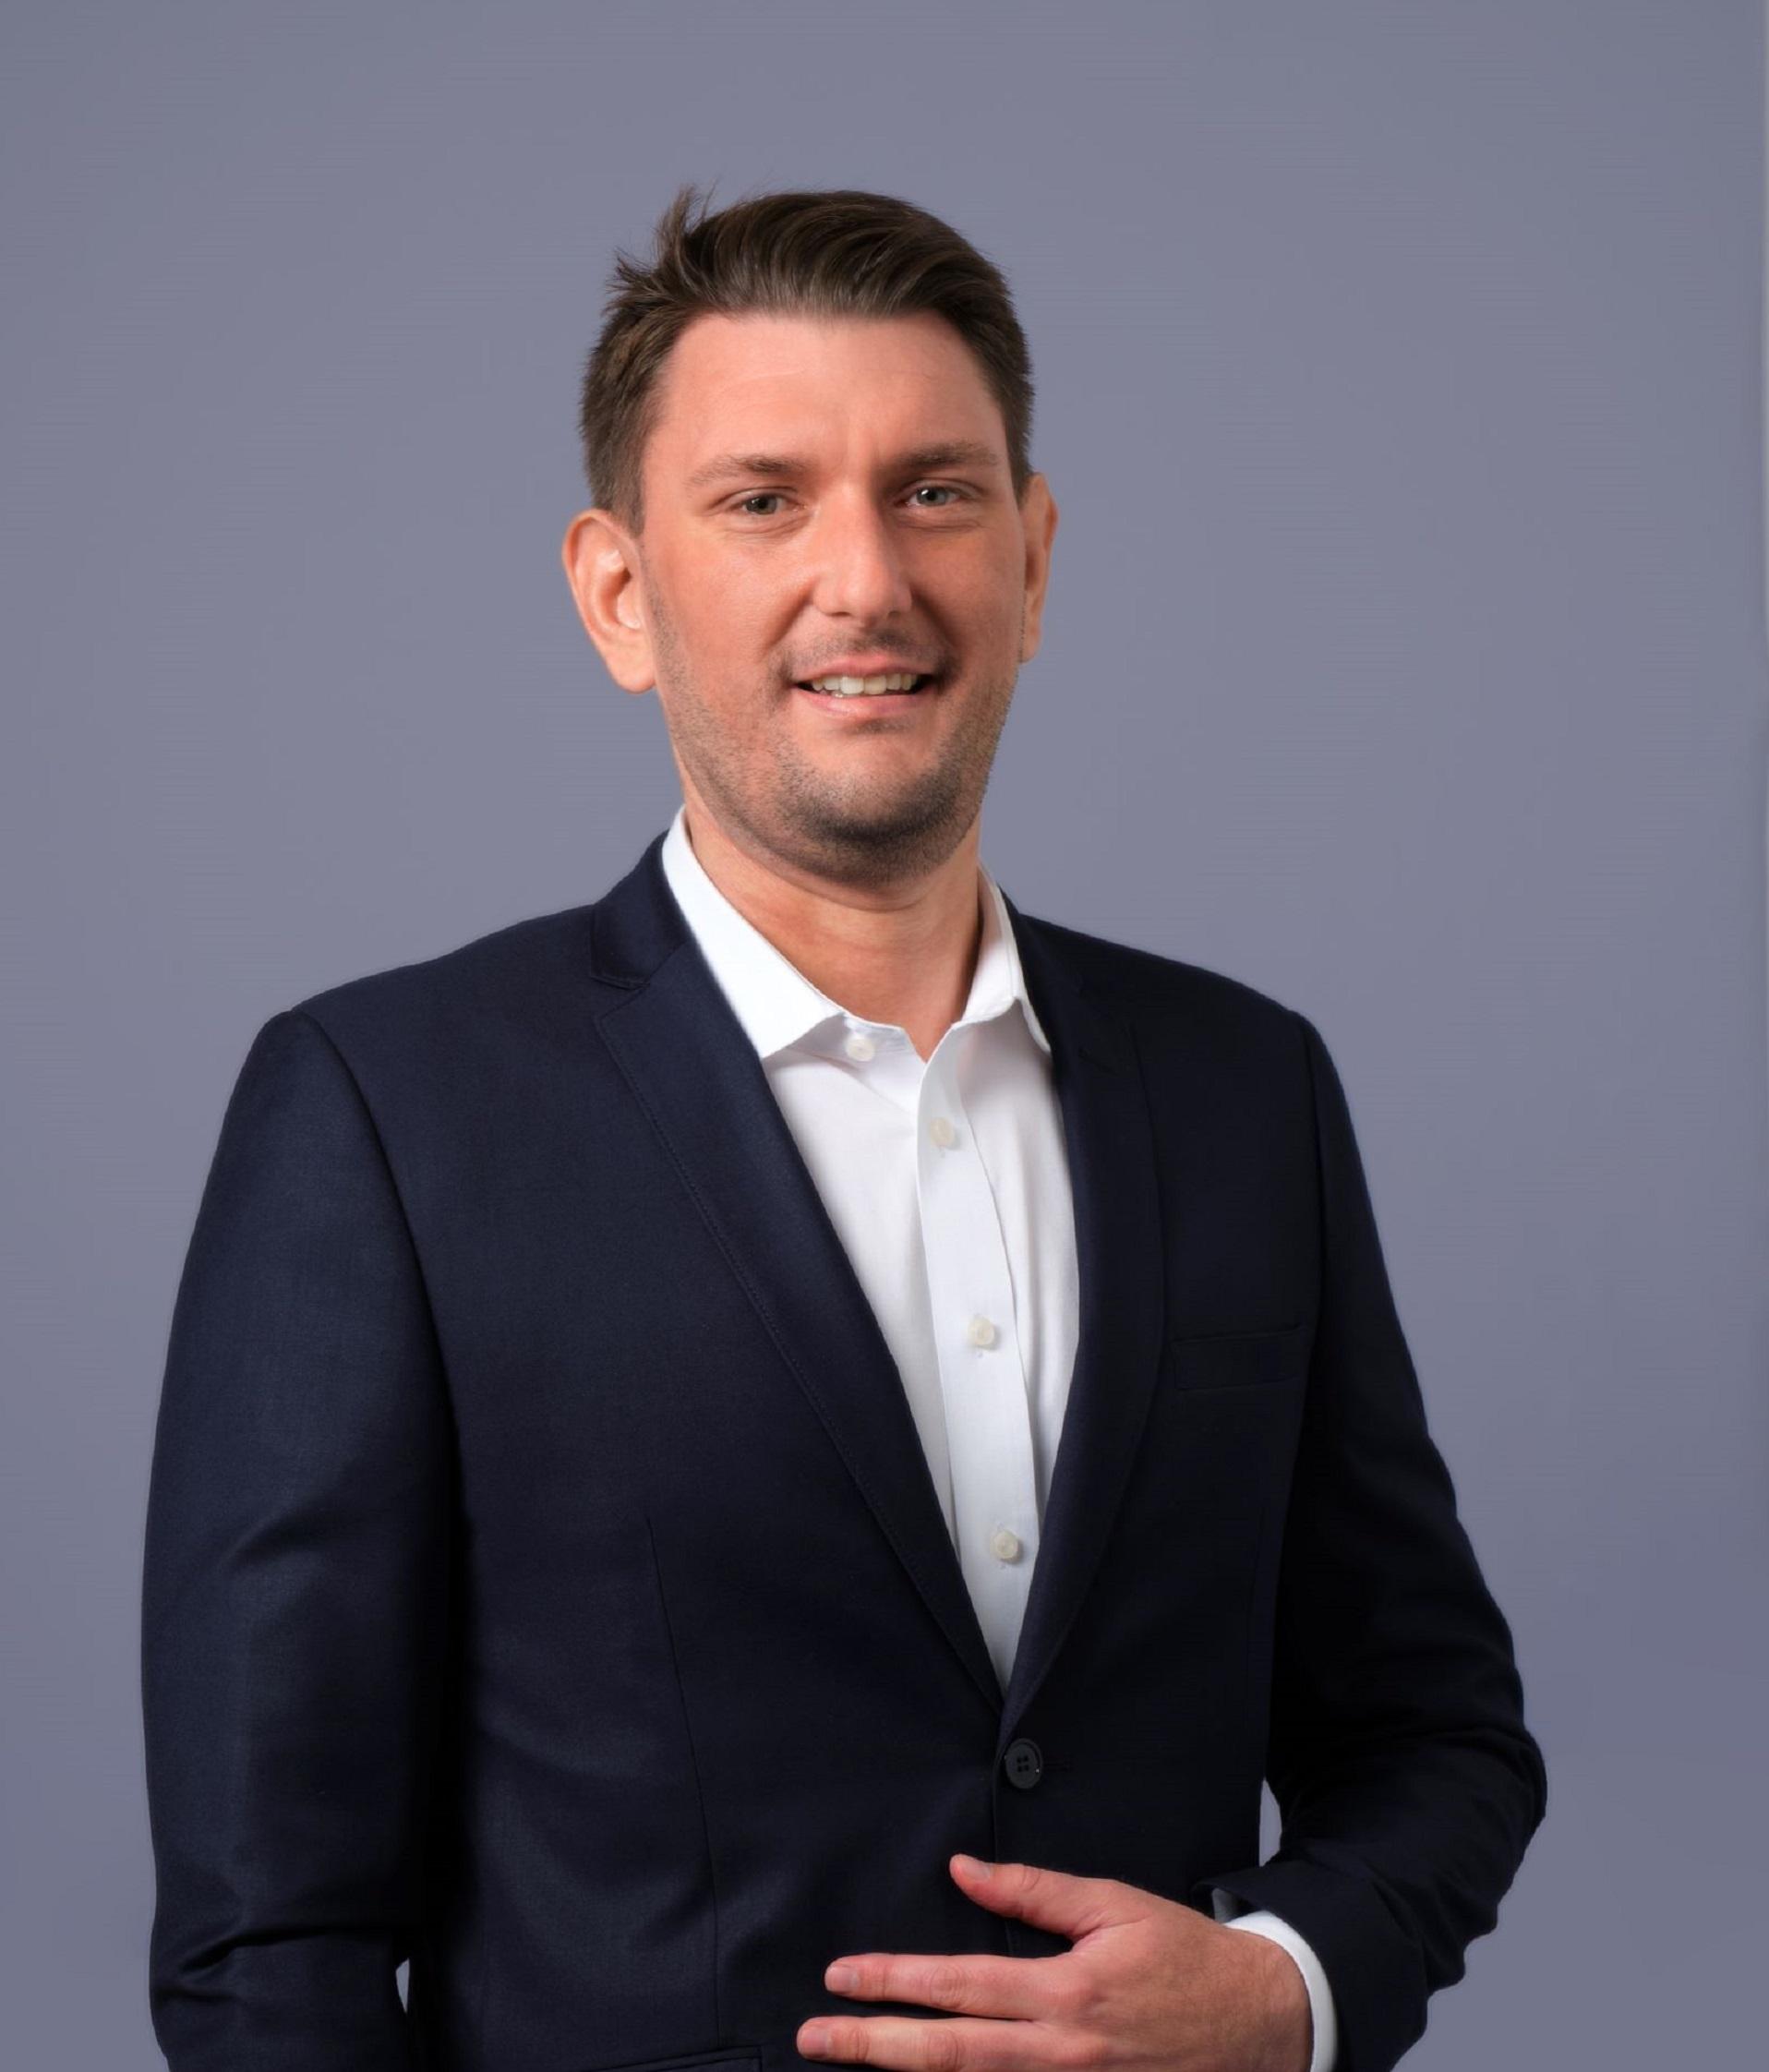 Daniel Michelson